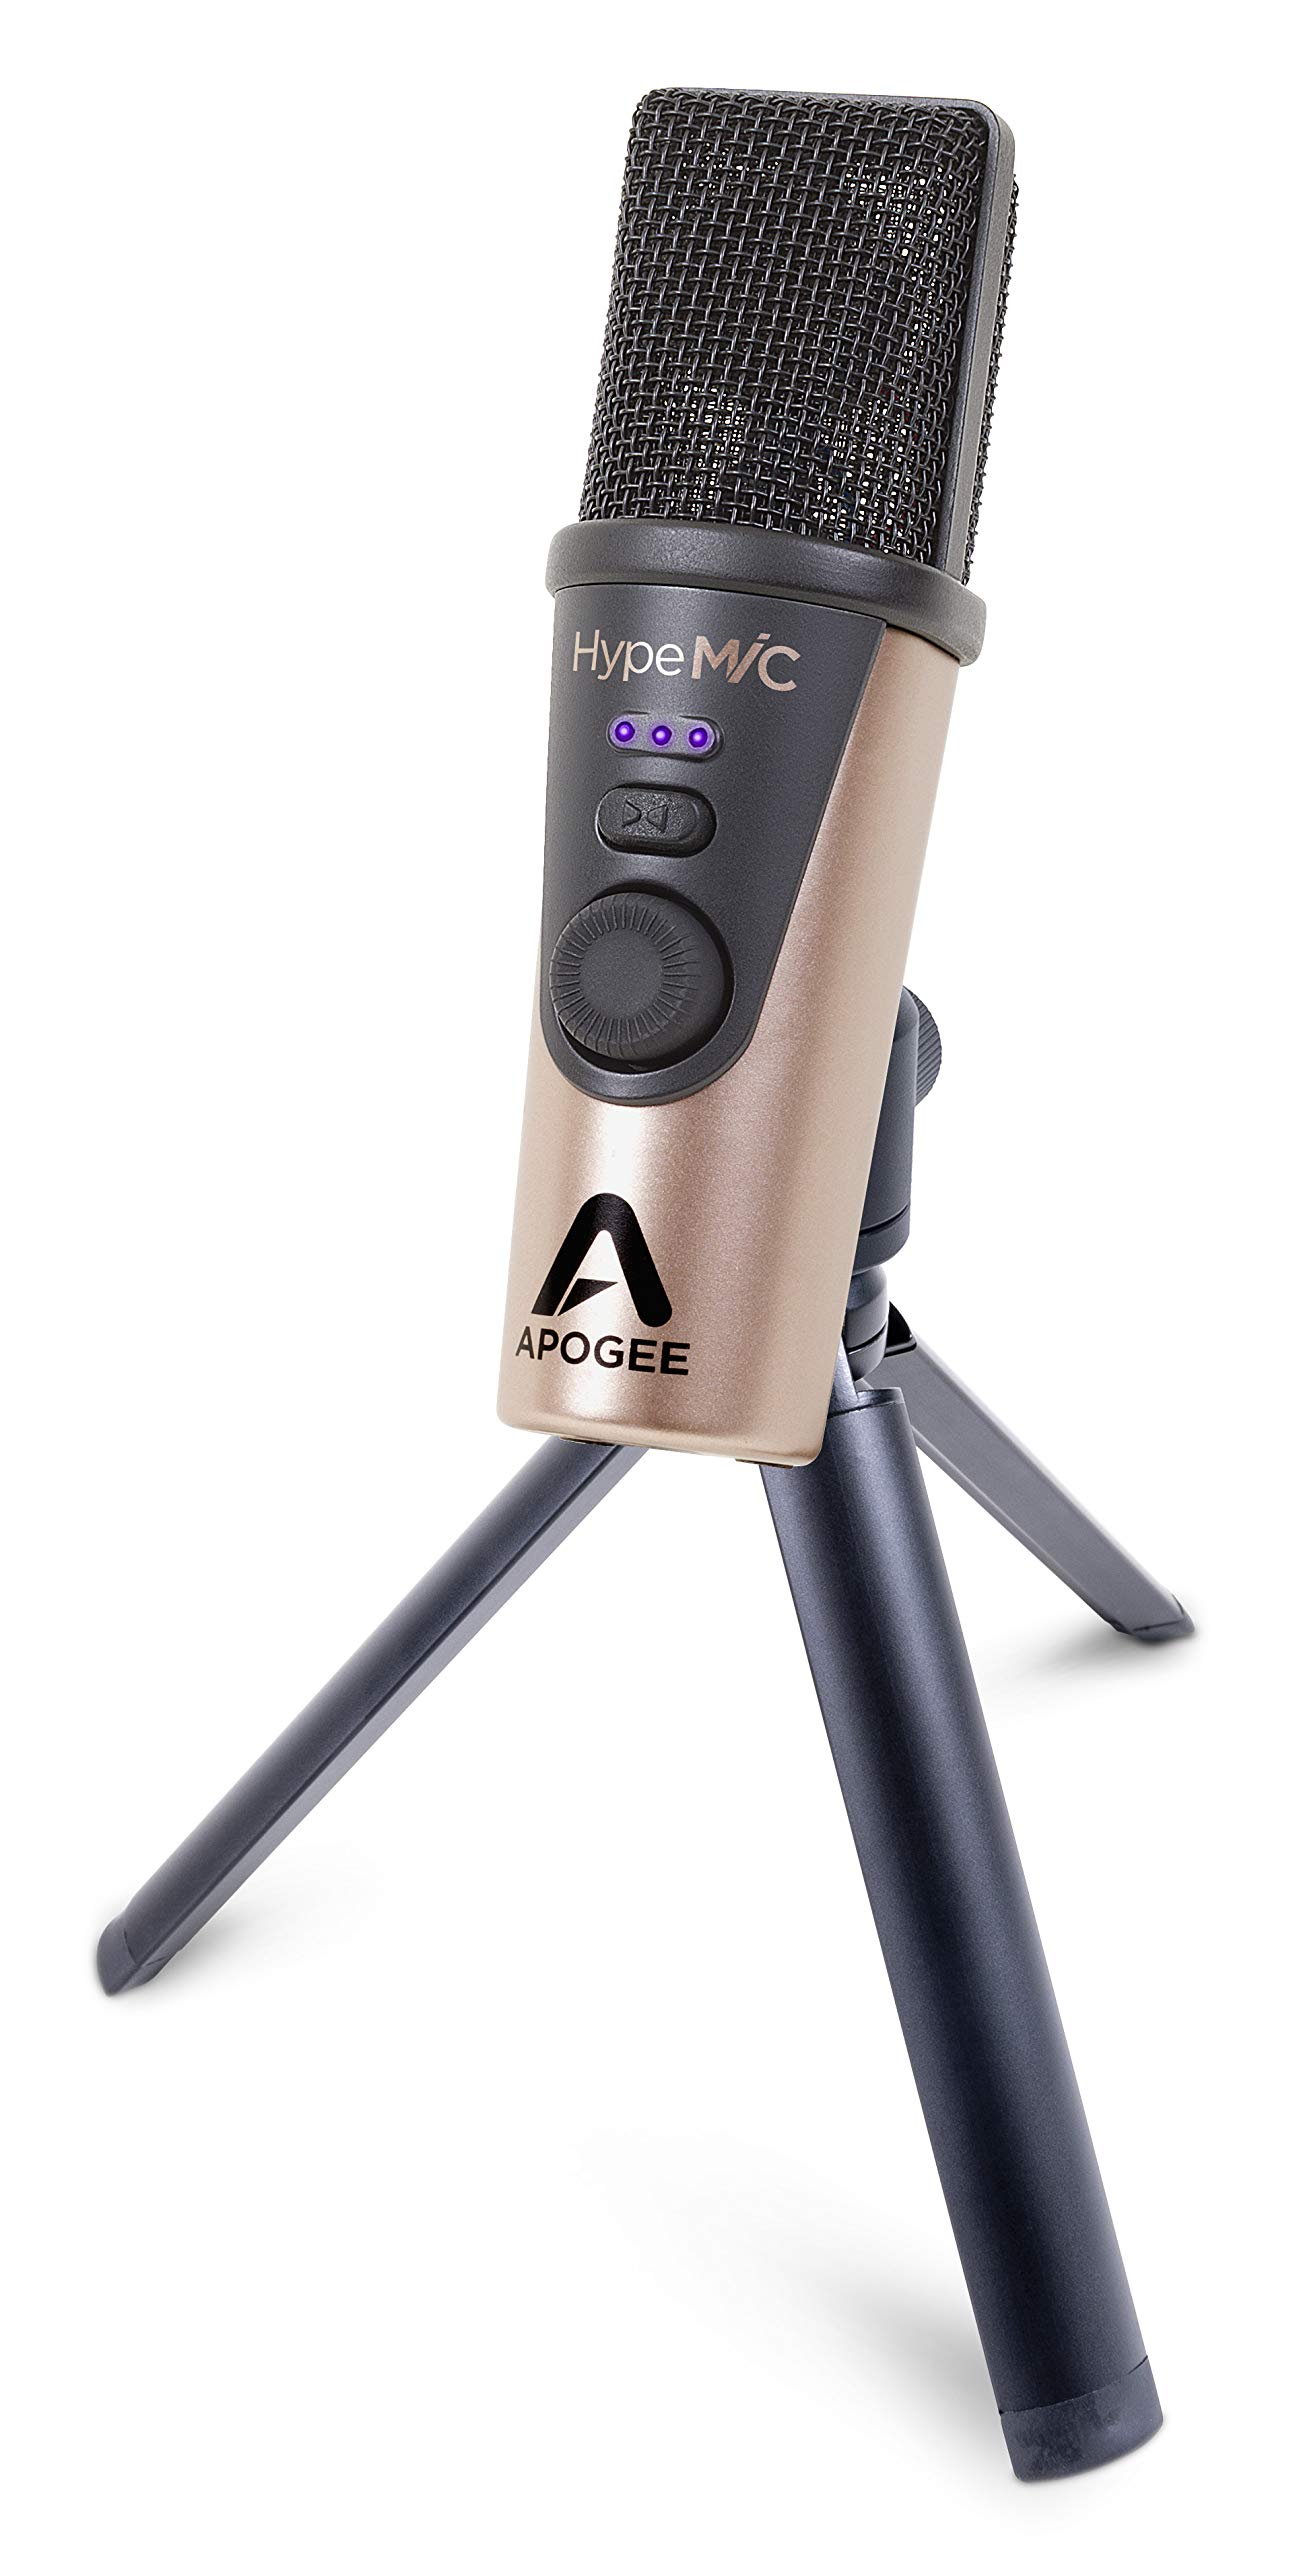 Apogee Hype Mic Analog Compressor USB Microphone